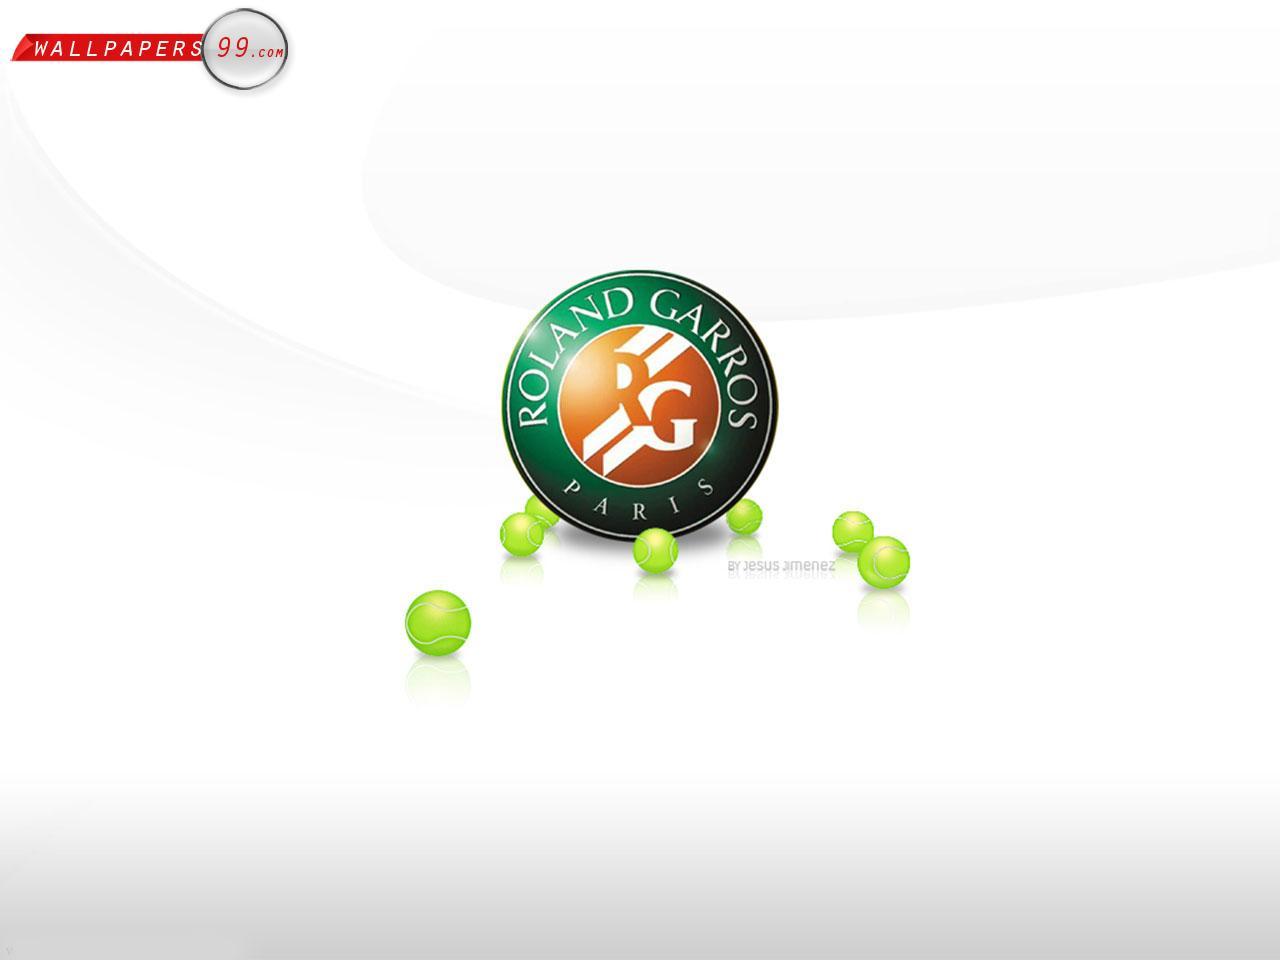 Roland Garros Wallpaper 8